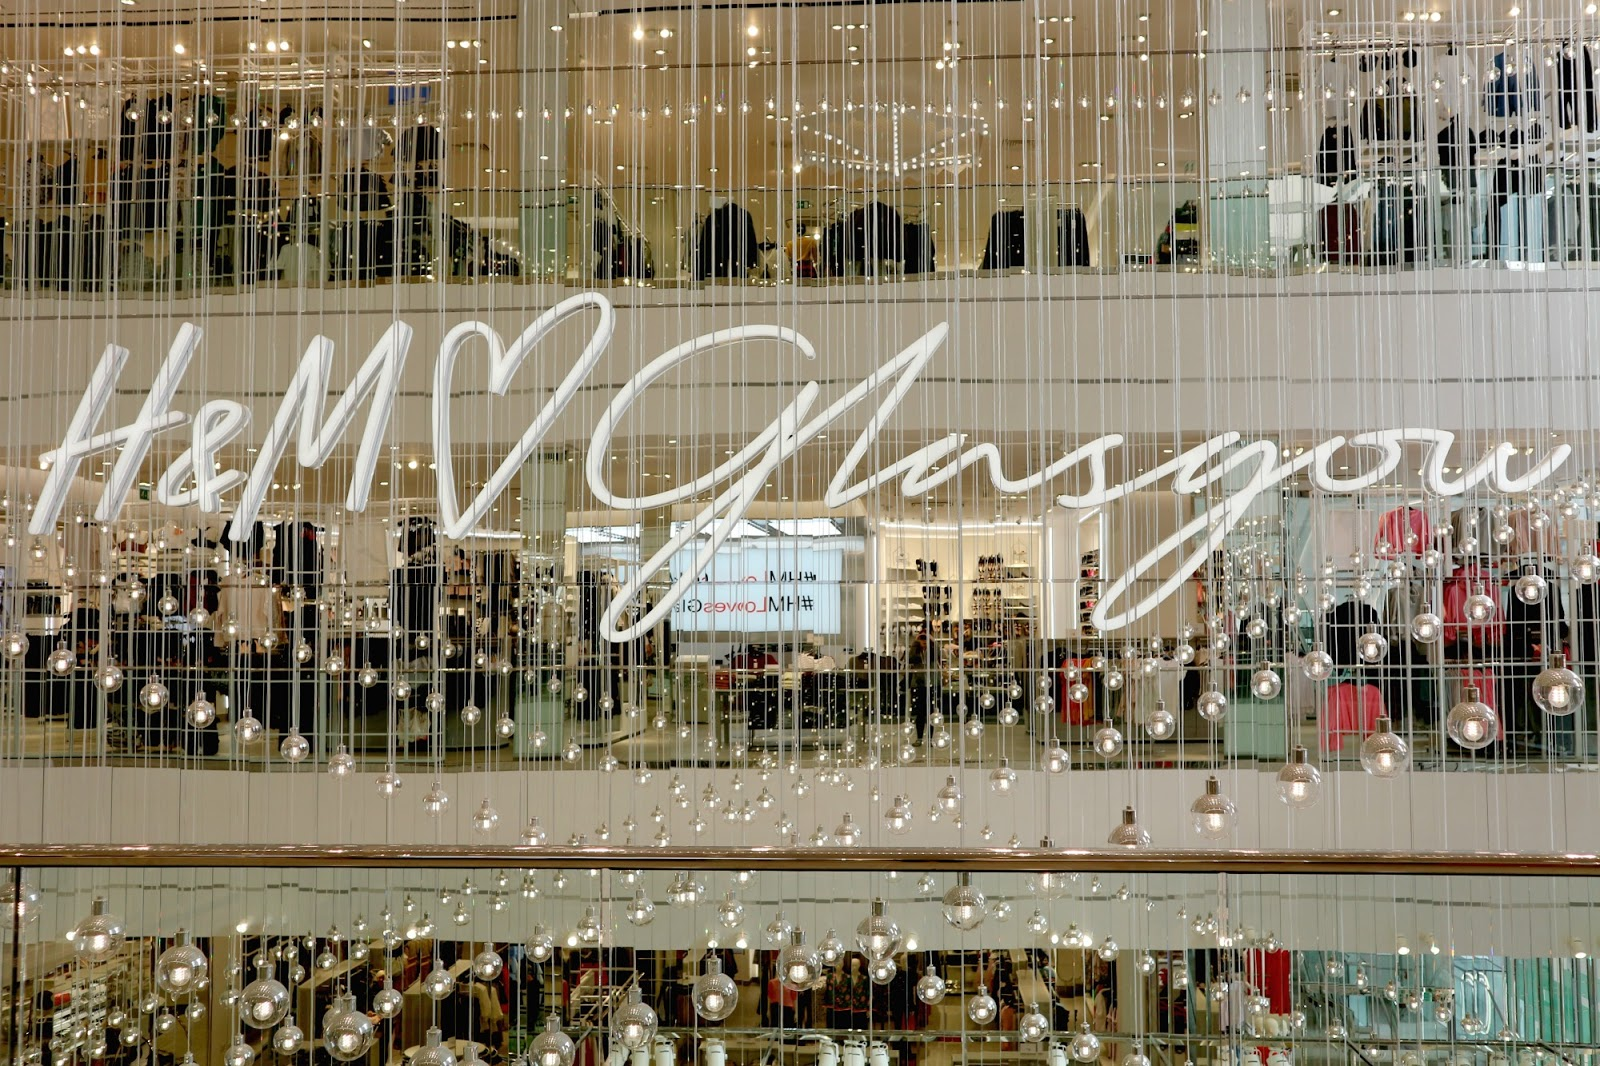 H&M Glasgow Buchanan